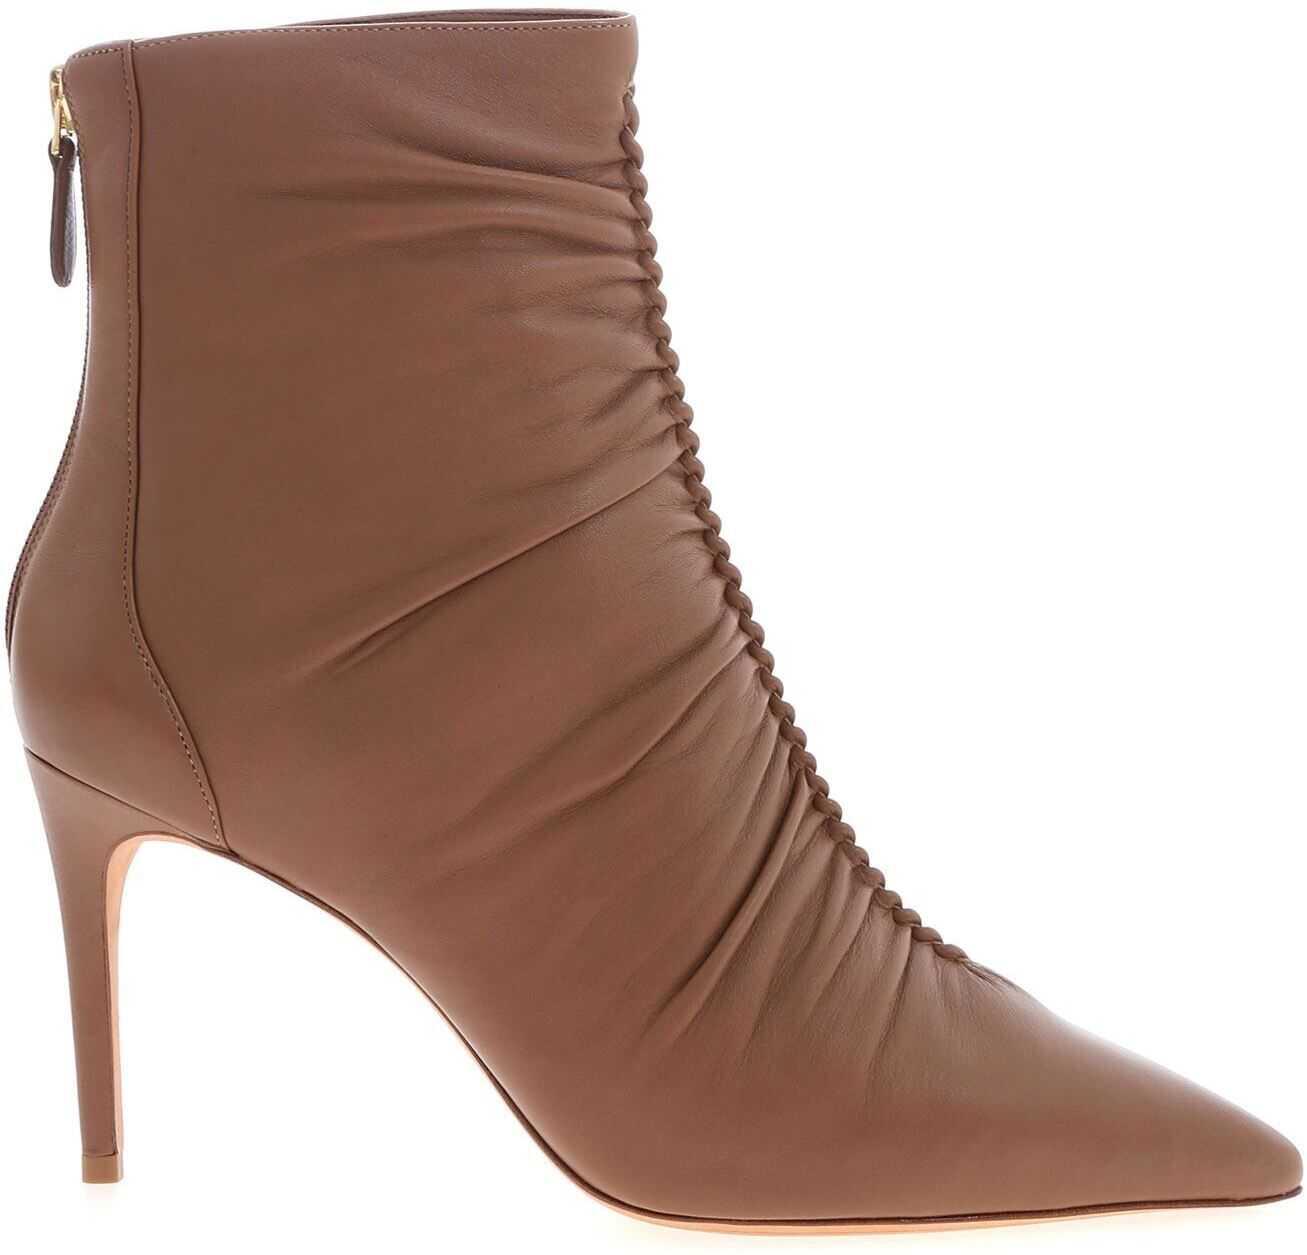 Alexandre Birman Susanna Bottie 85 Boots In Beige Brown